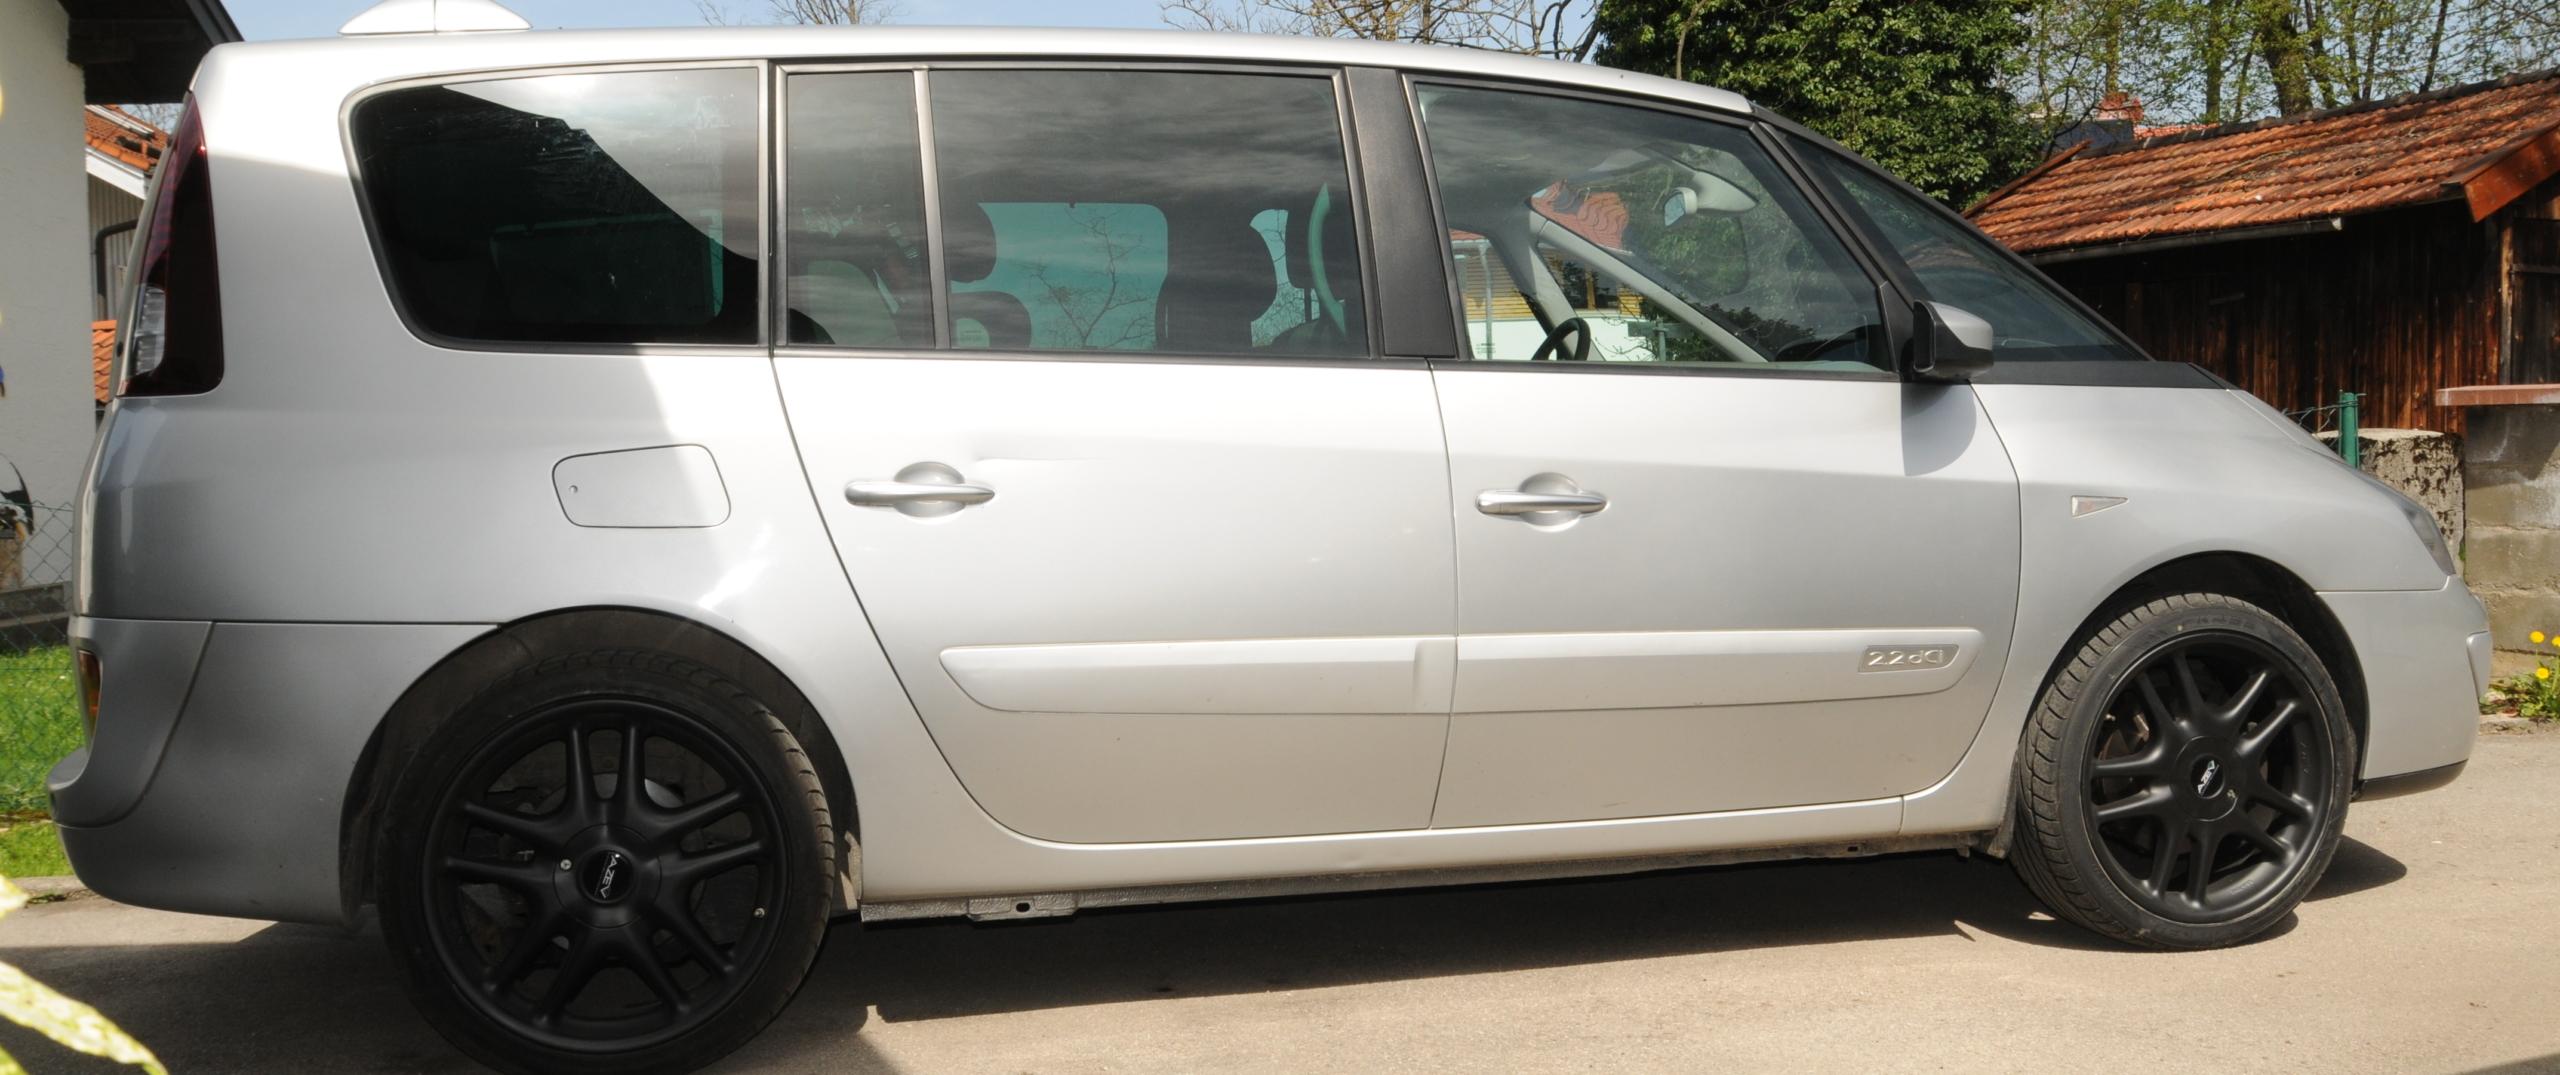 Renault – Espace – Silber – AZEV – Typ A – Schwarz – 20 Zoll